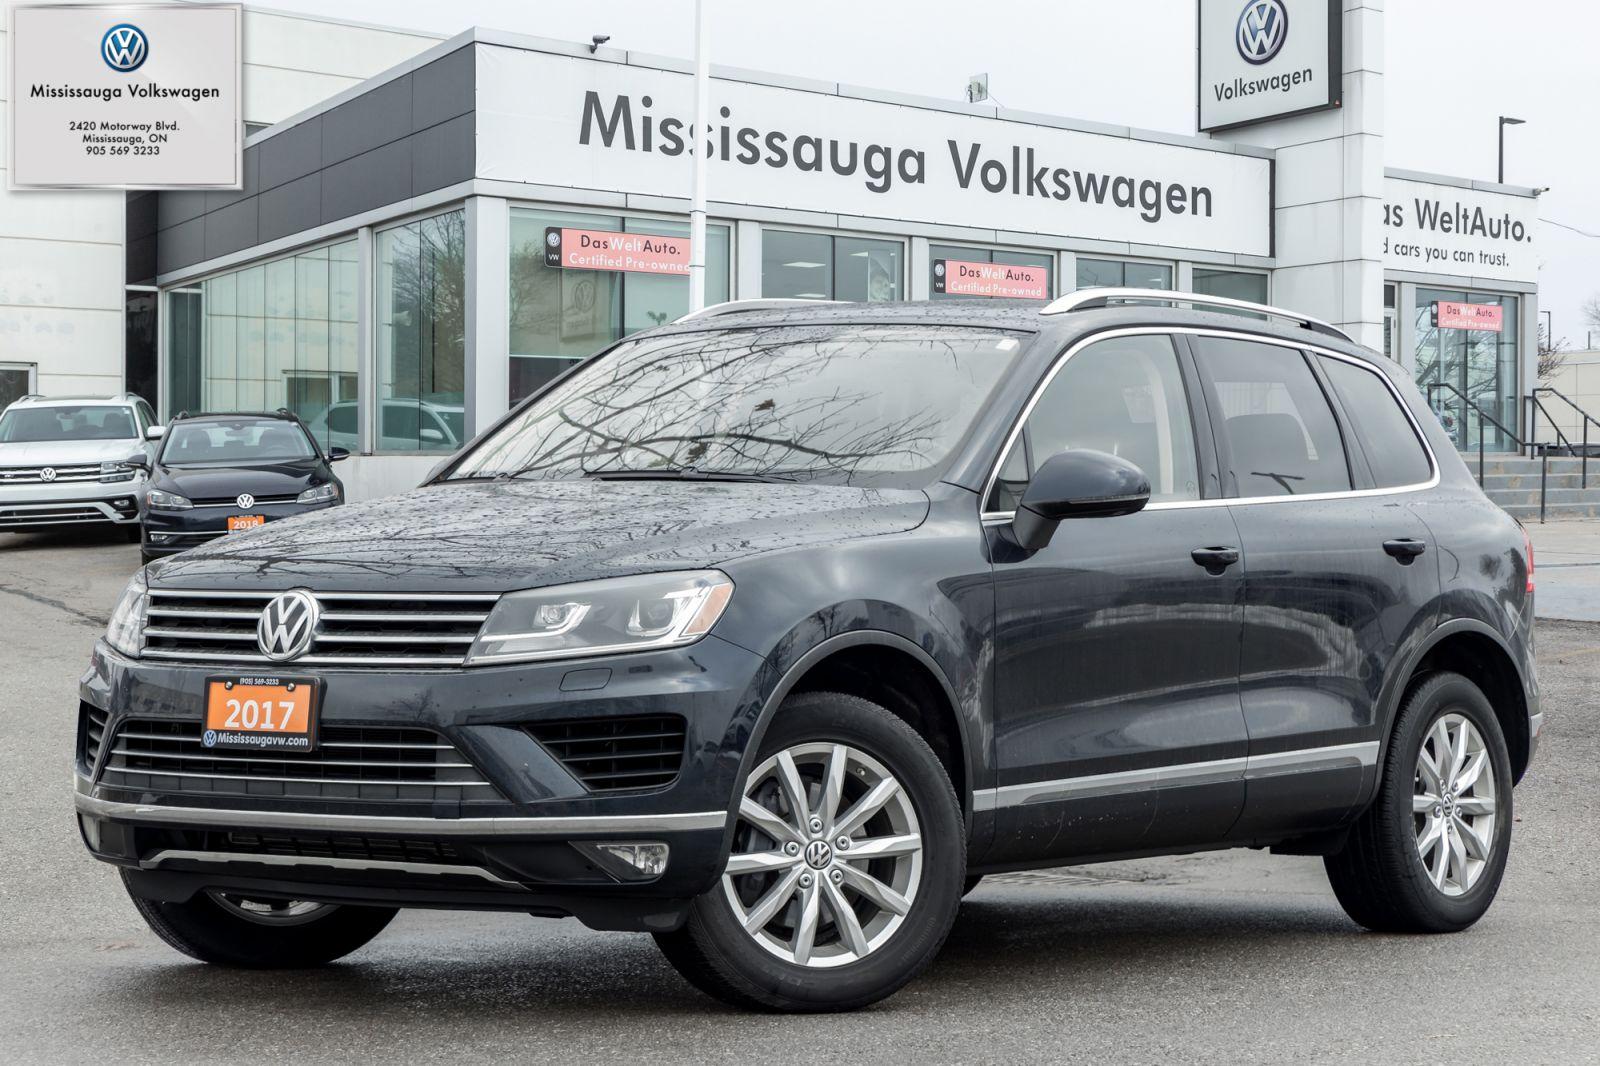 2017 Volkswagen Touareg Image